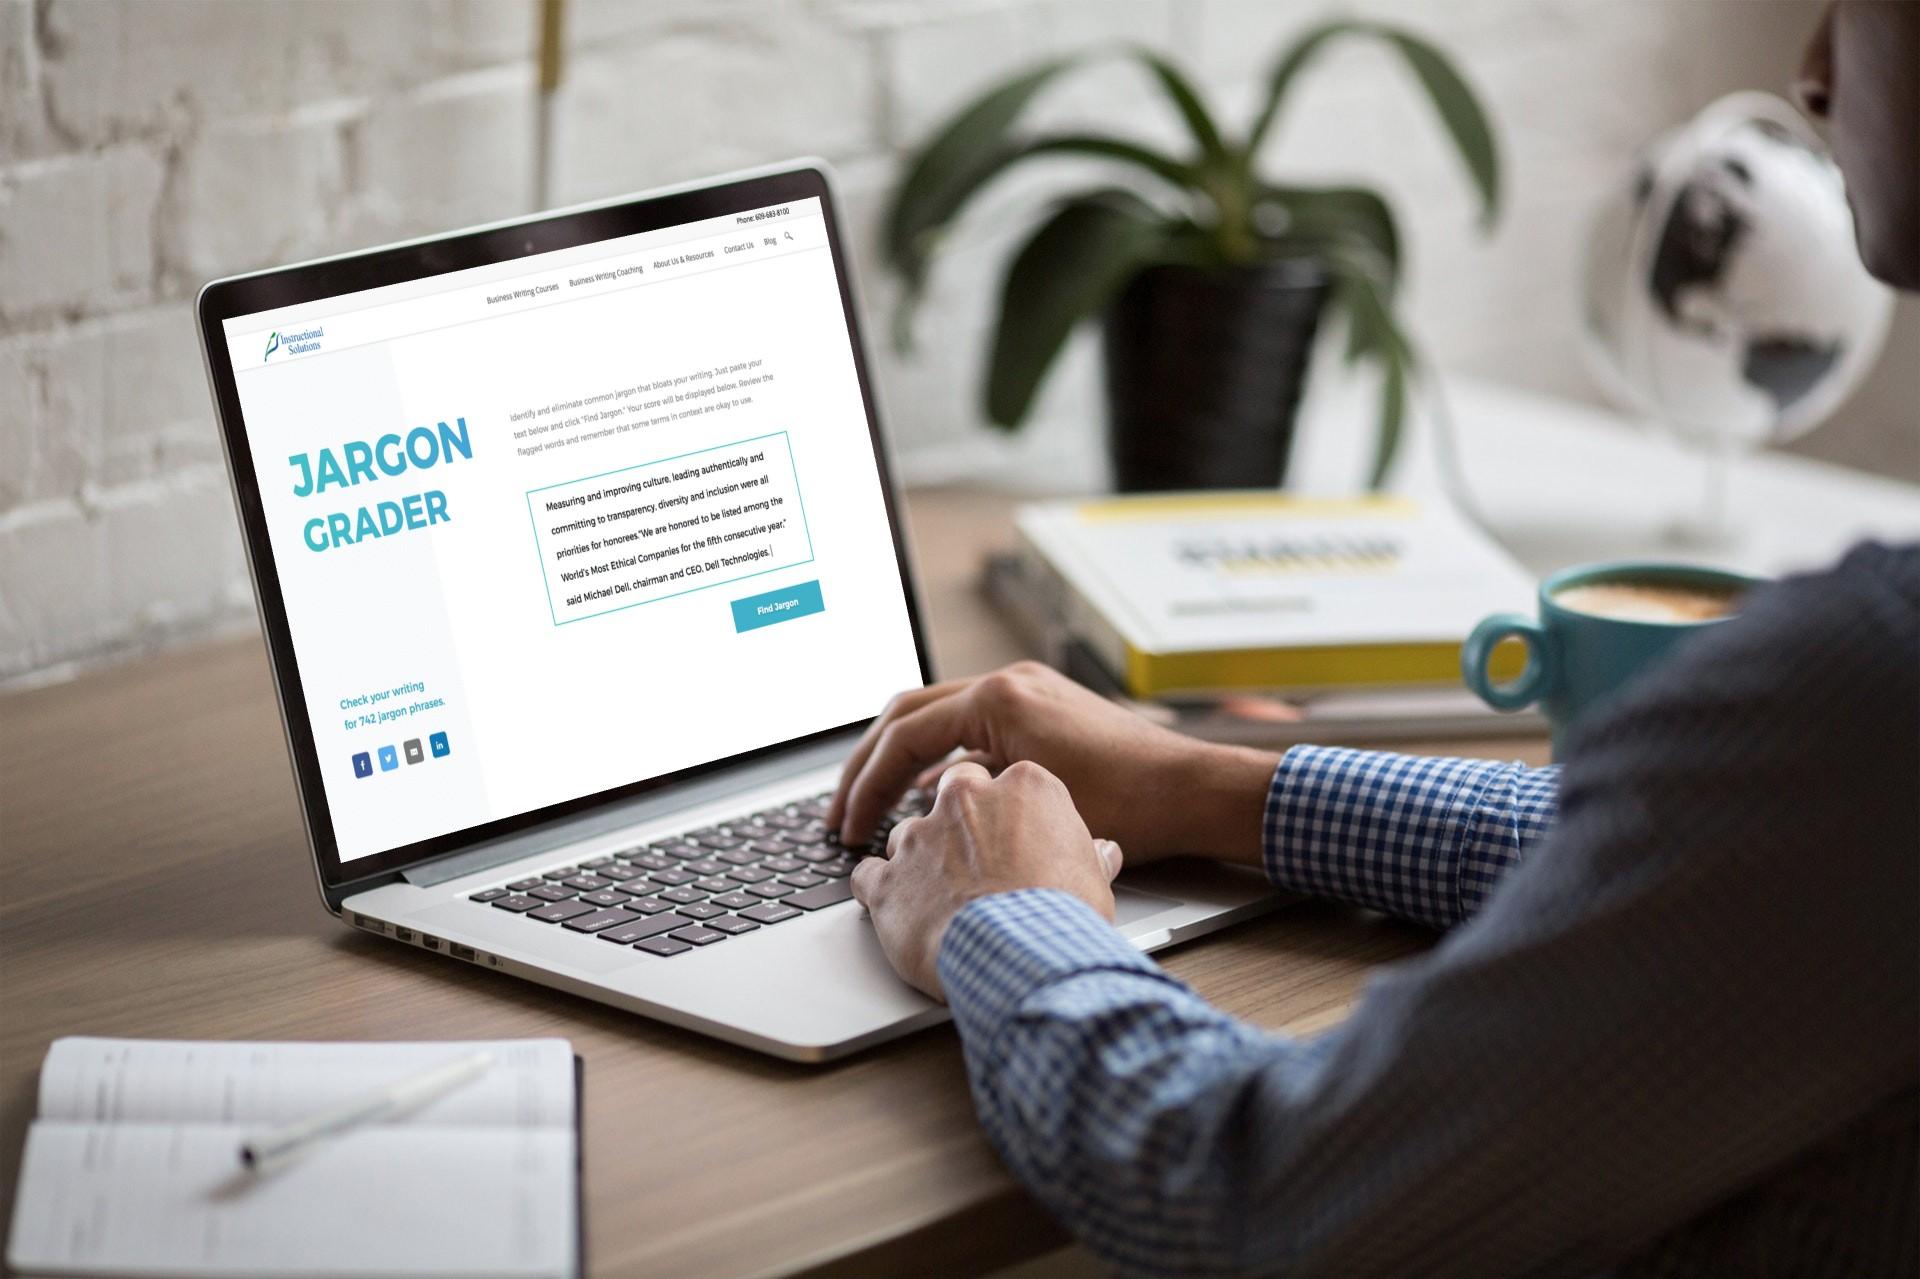 jargon grader on laptop